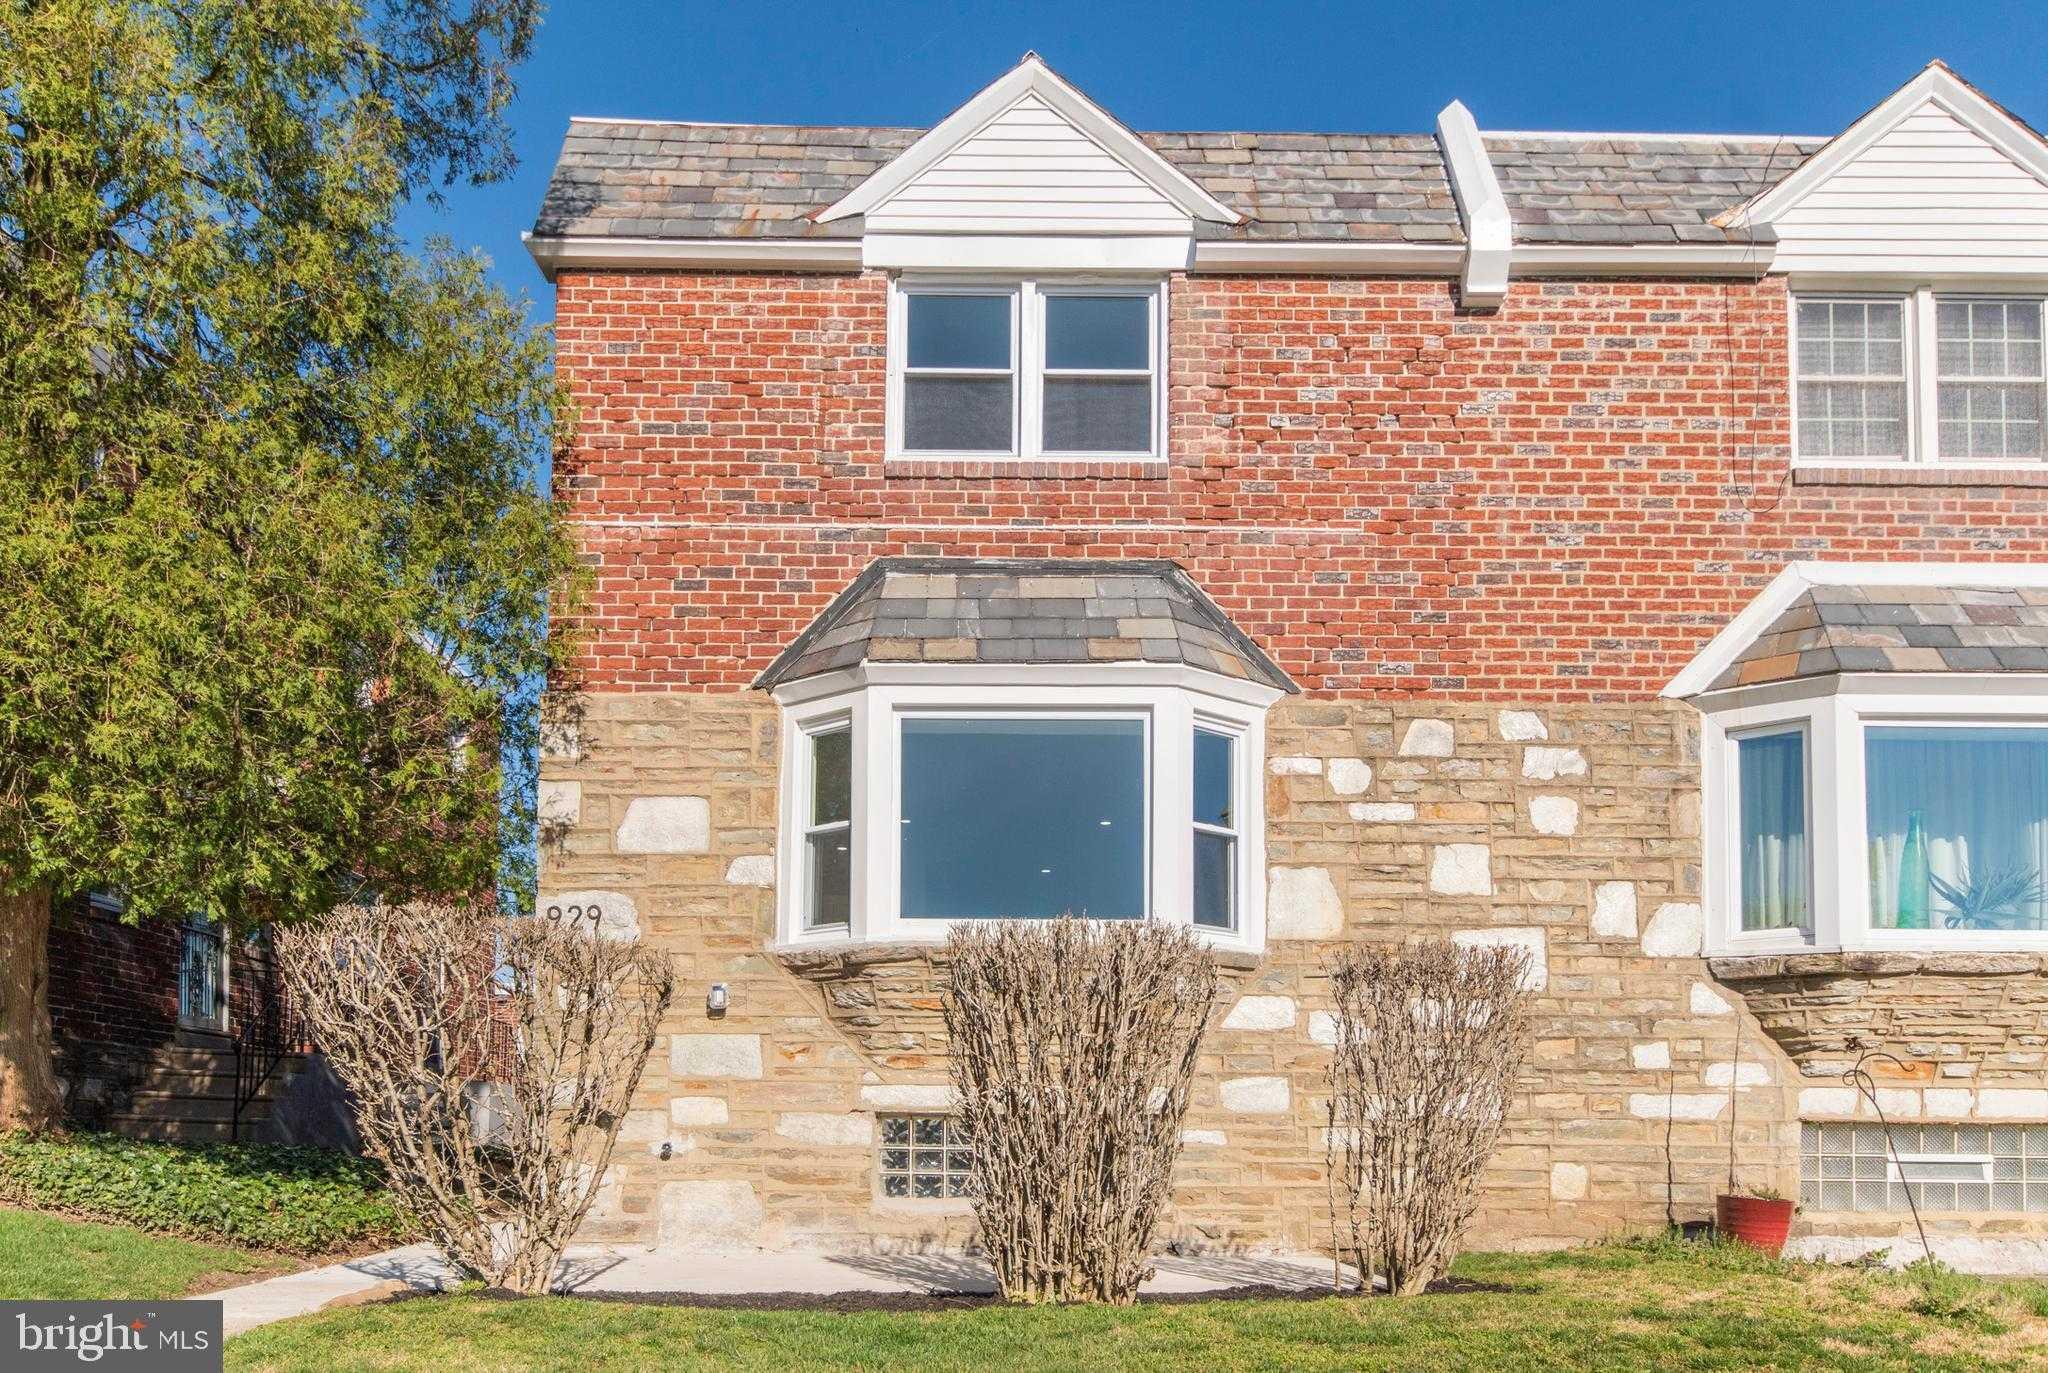 $380,000 - 3Br/4Ba -  for Sale in Cedarbrook, Philadelphia